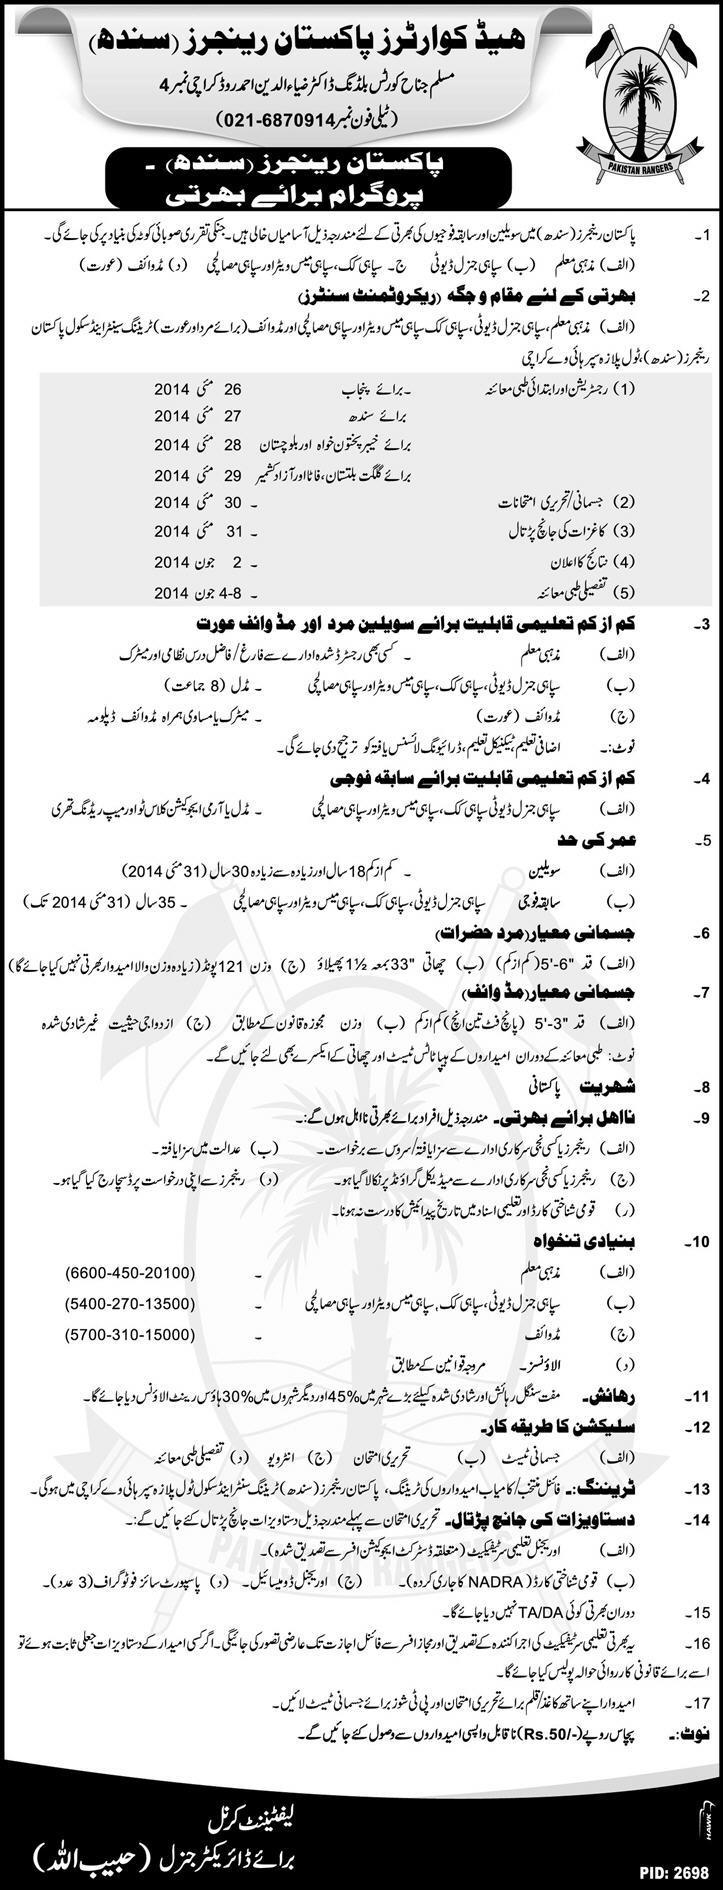 Pakistan Rangers Sindh Jobs Karachi 2014